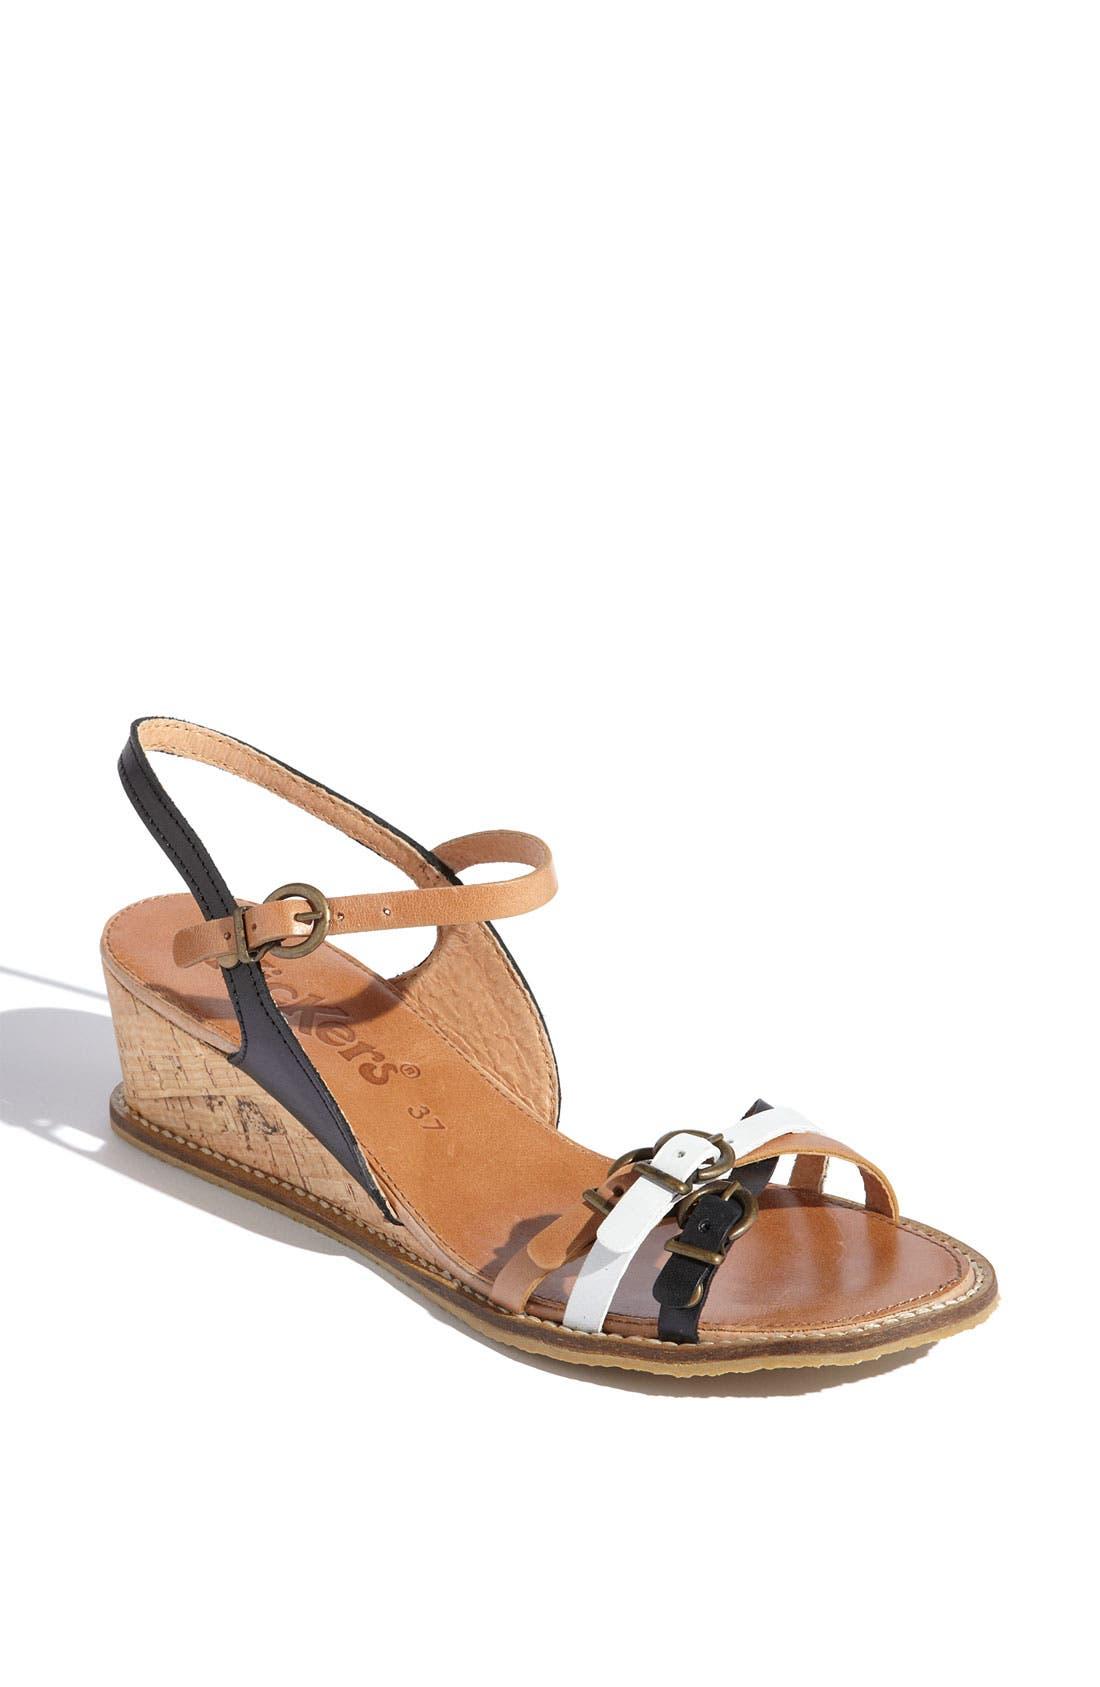 KICKERS 'Spring' Sandal